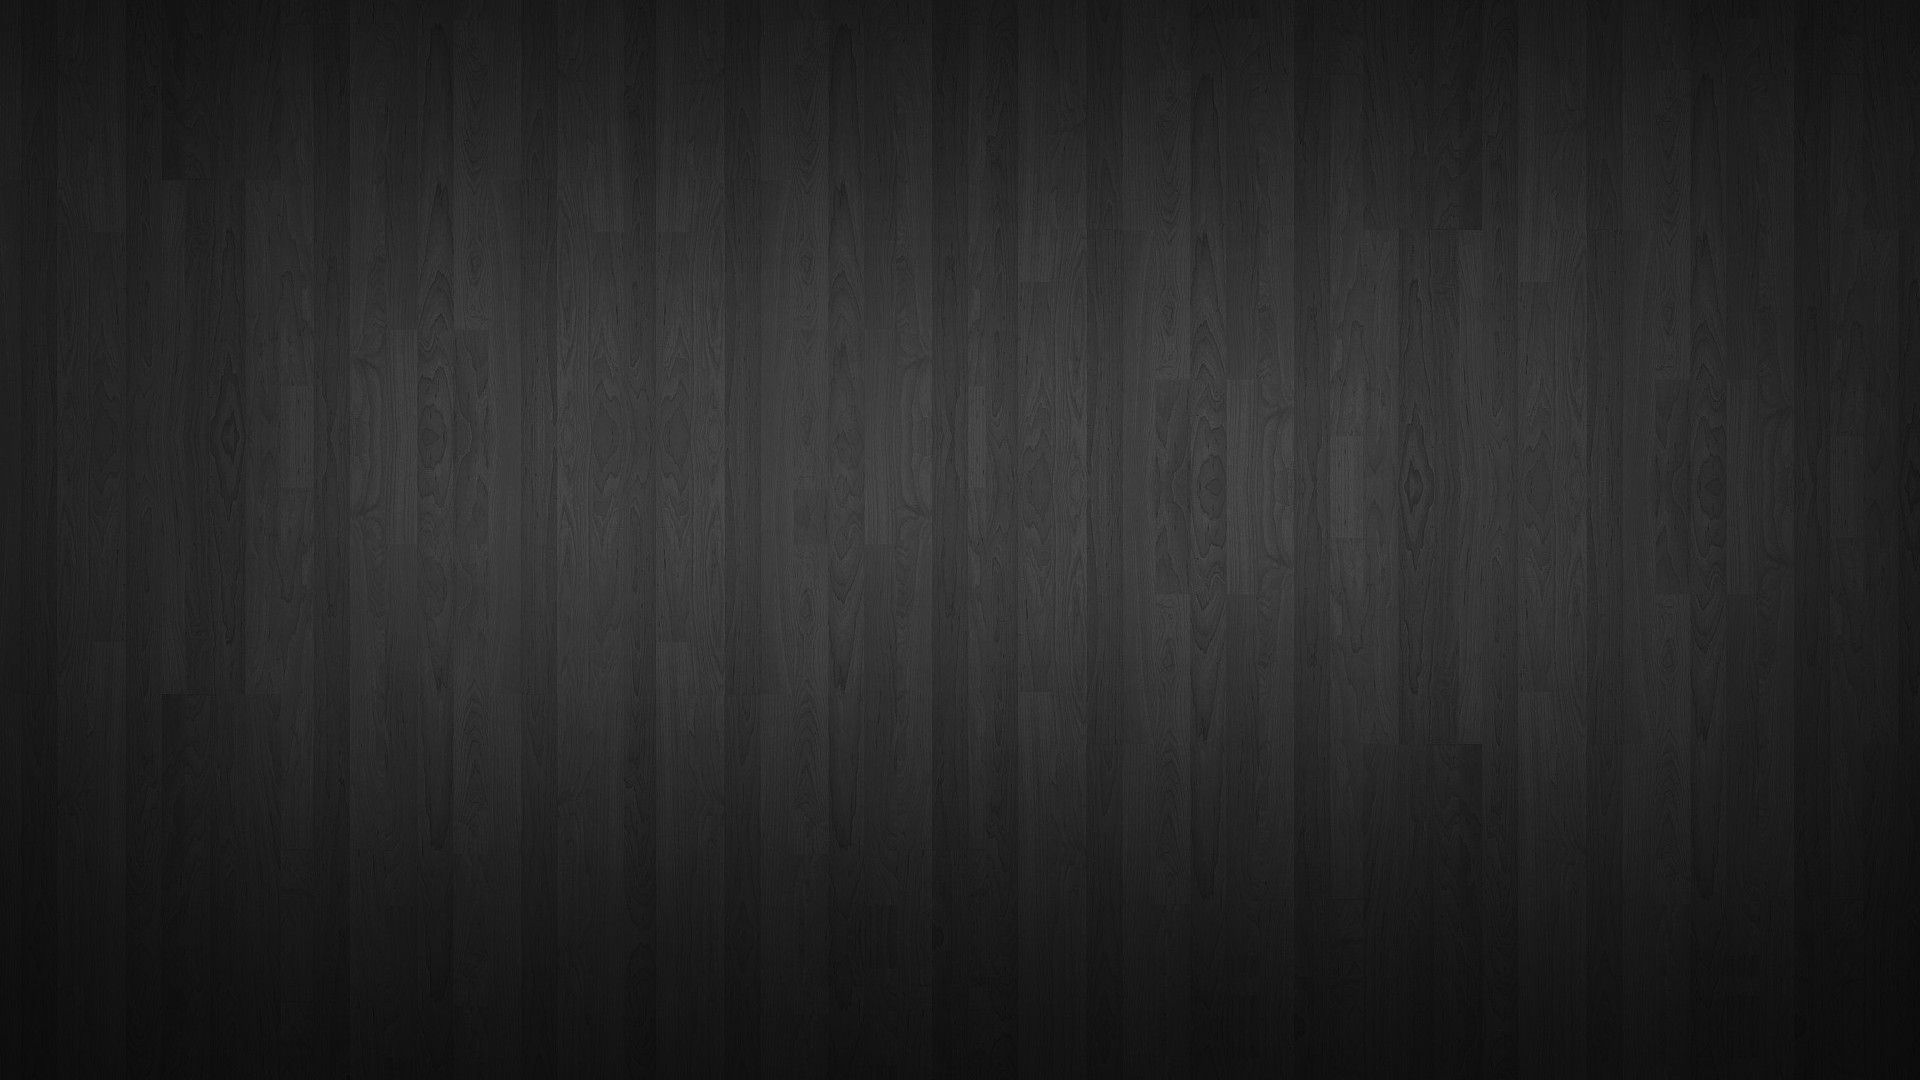 General 1920x1080 Texture Wood Wallpaper Dark Wood Texture Black Wallpaper